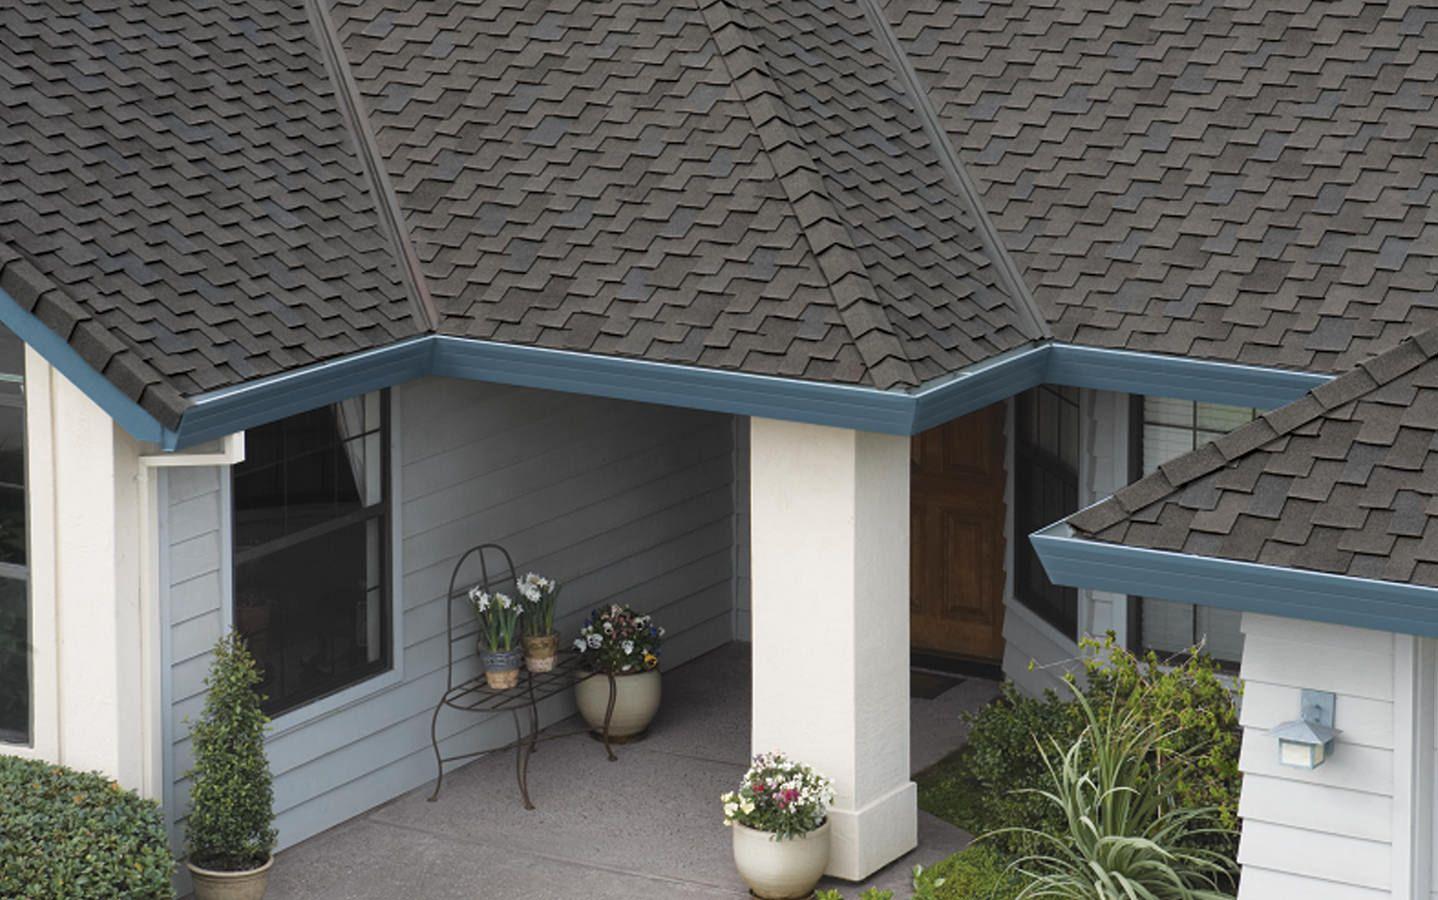 Best Woodcrest Roofing Shingles Owens Corning Roof Shingle 400 x 300